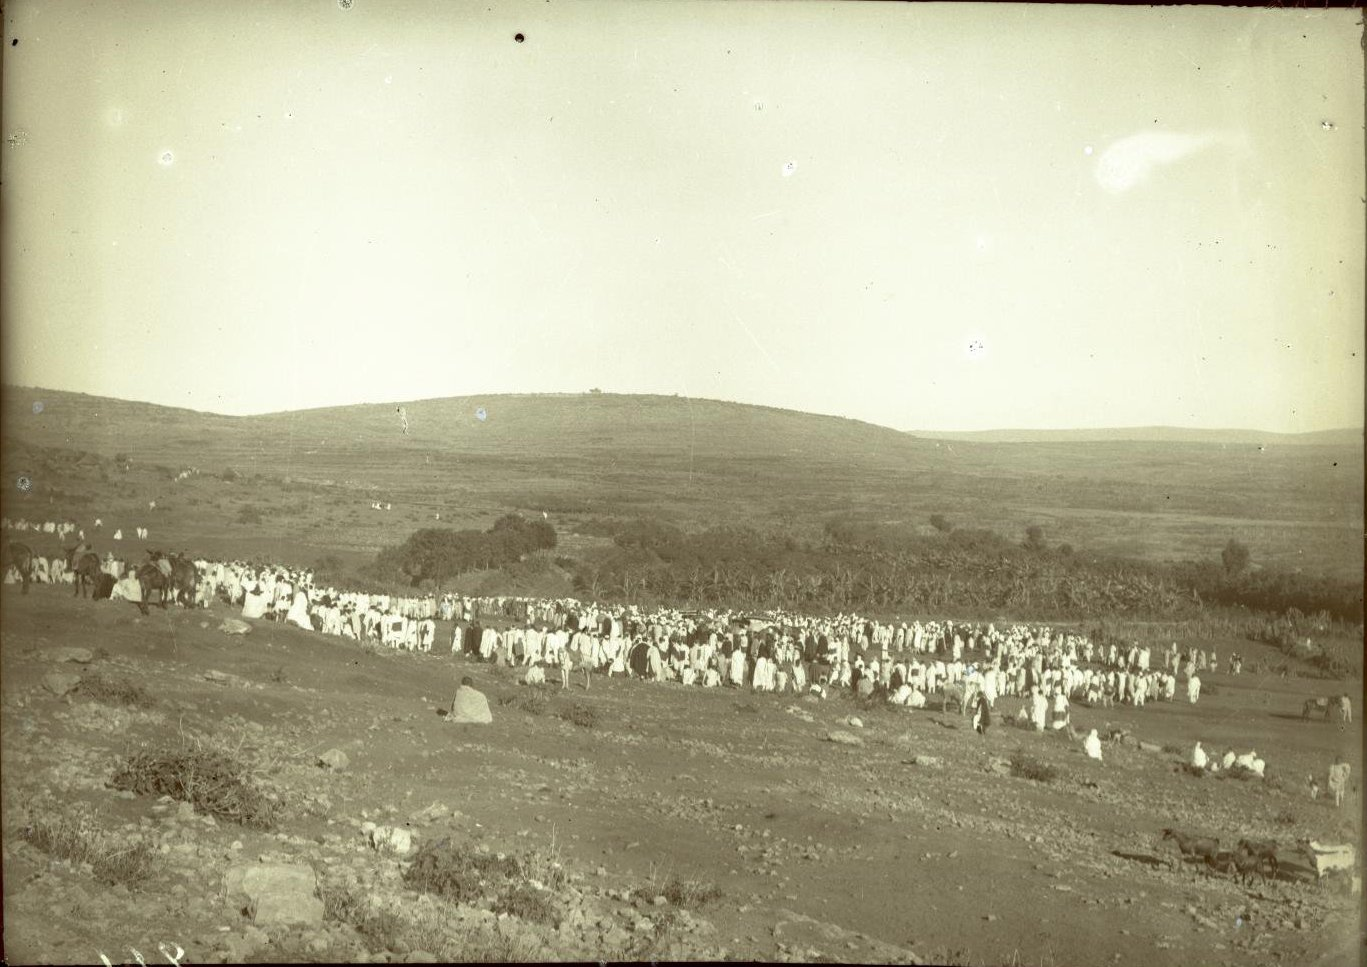 261. Абиссиния, провинция Харар, г. Харар. Крестный ход